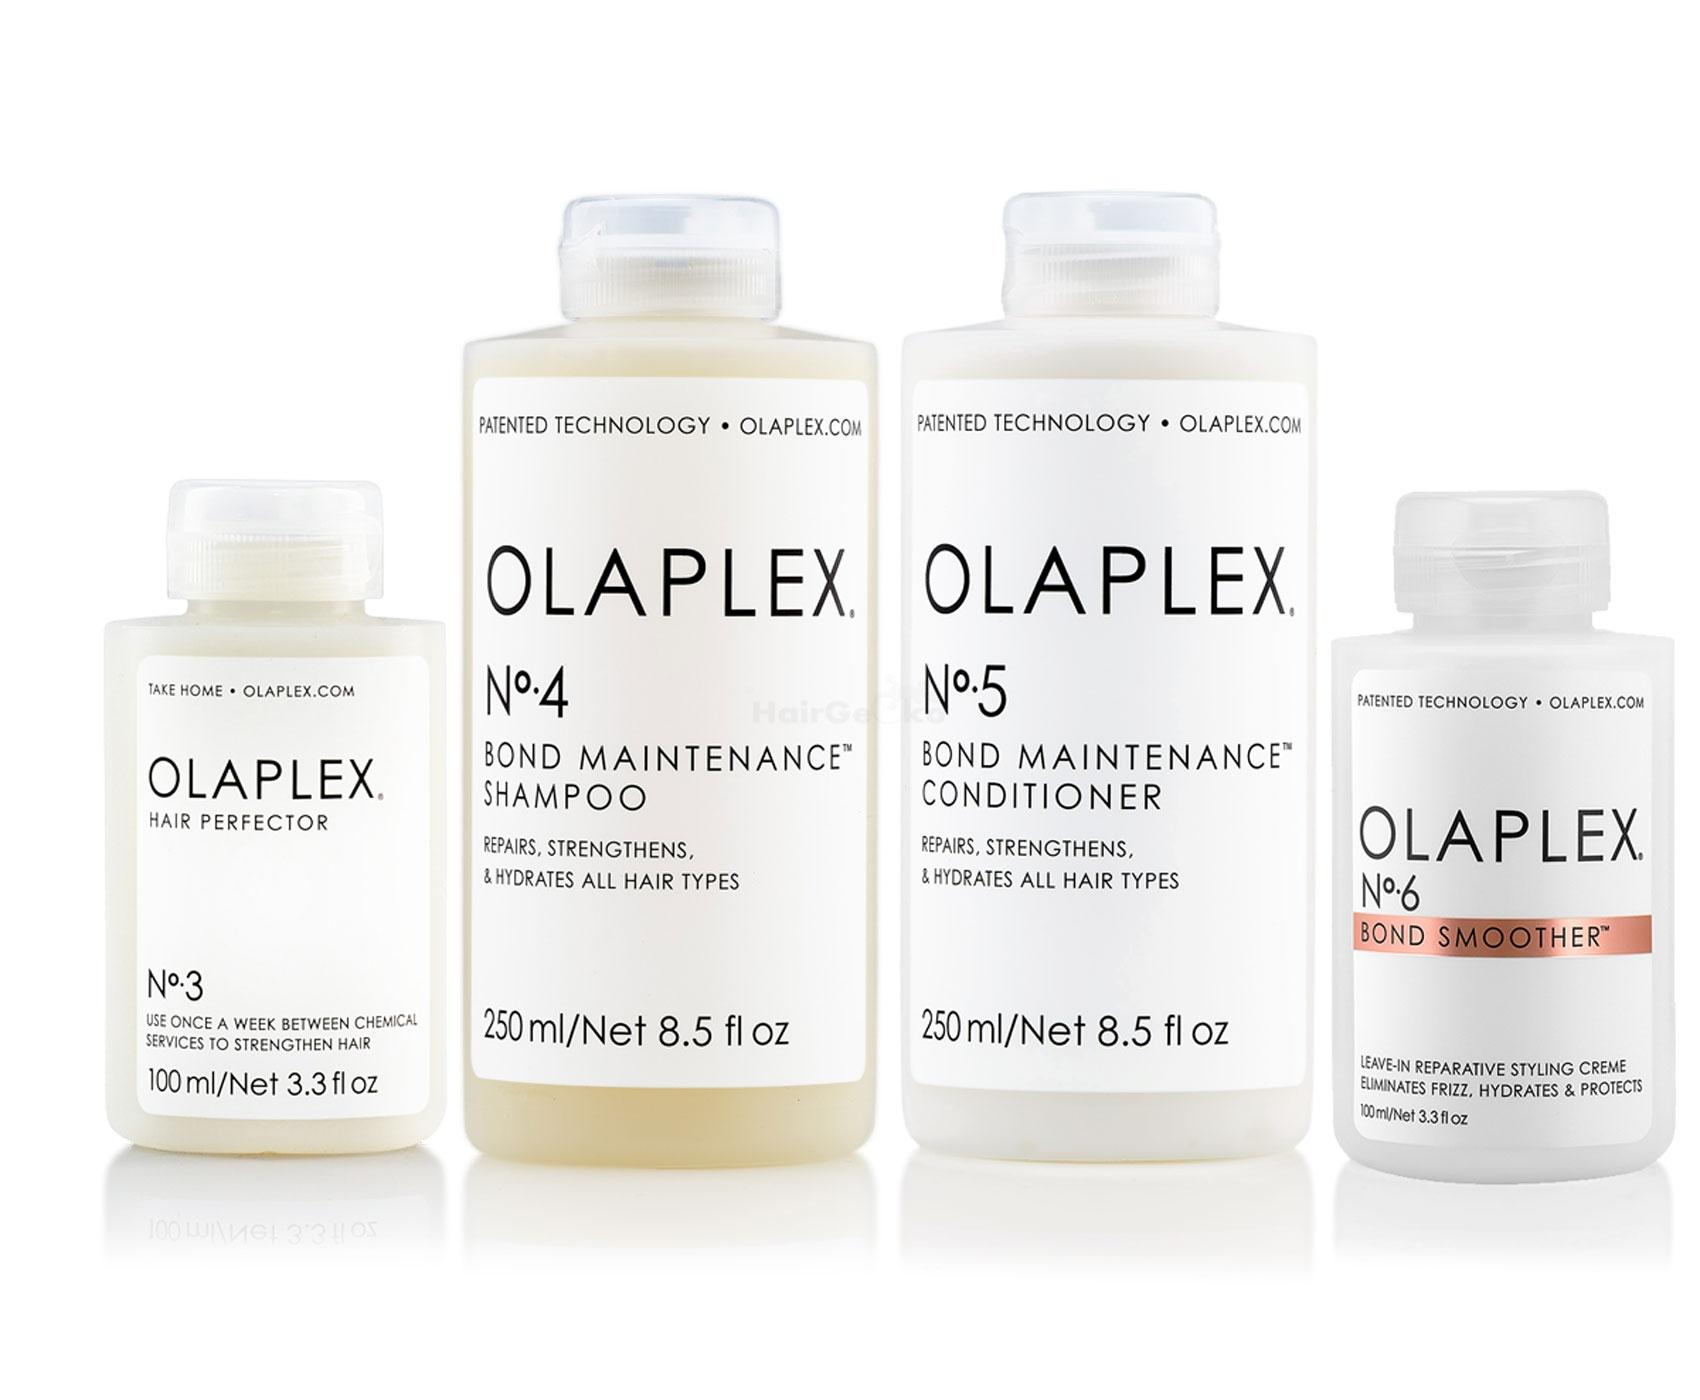 Olaplex Set - Olaplex Bond Maintenance Shampoo No 4 (250ml) + Olaplex Bond Maintenance Conditioner No 5 (250ml) + Olaplex Hair Perfector No 3 (100ml) + Olaplex Bond Smoother No 6 (100ml )